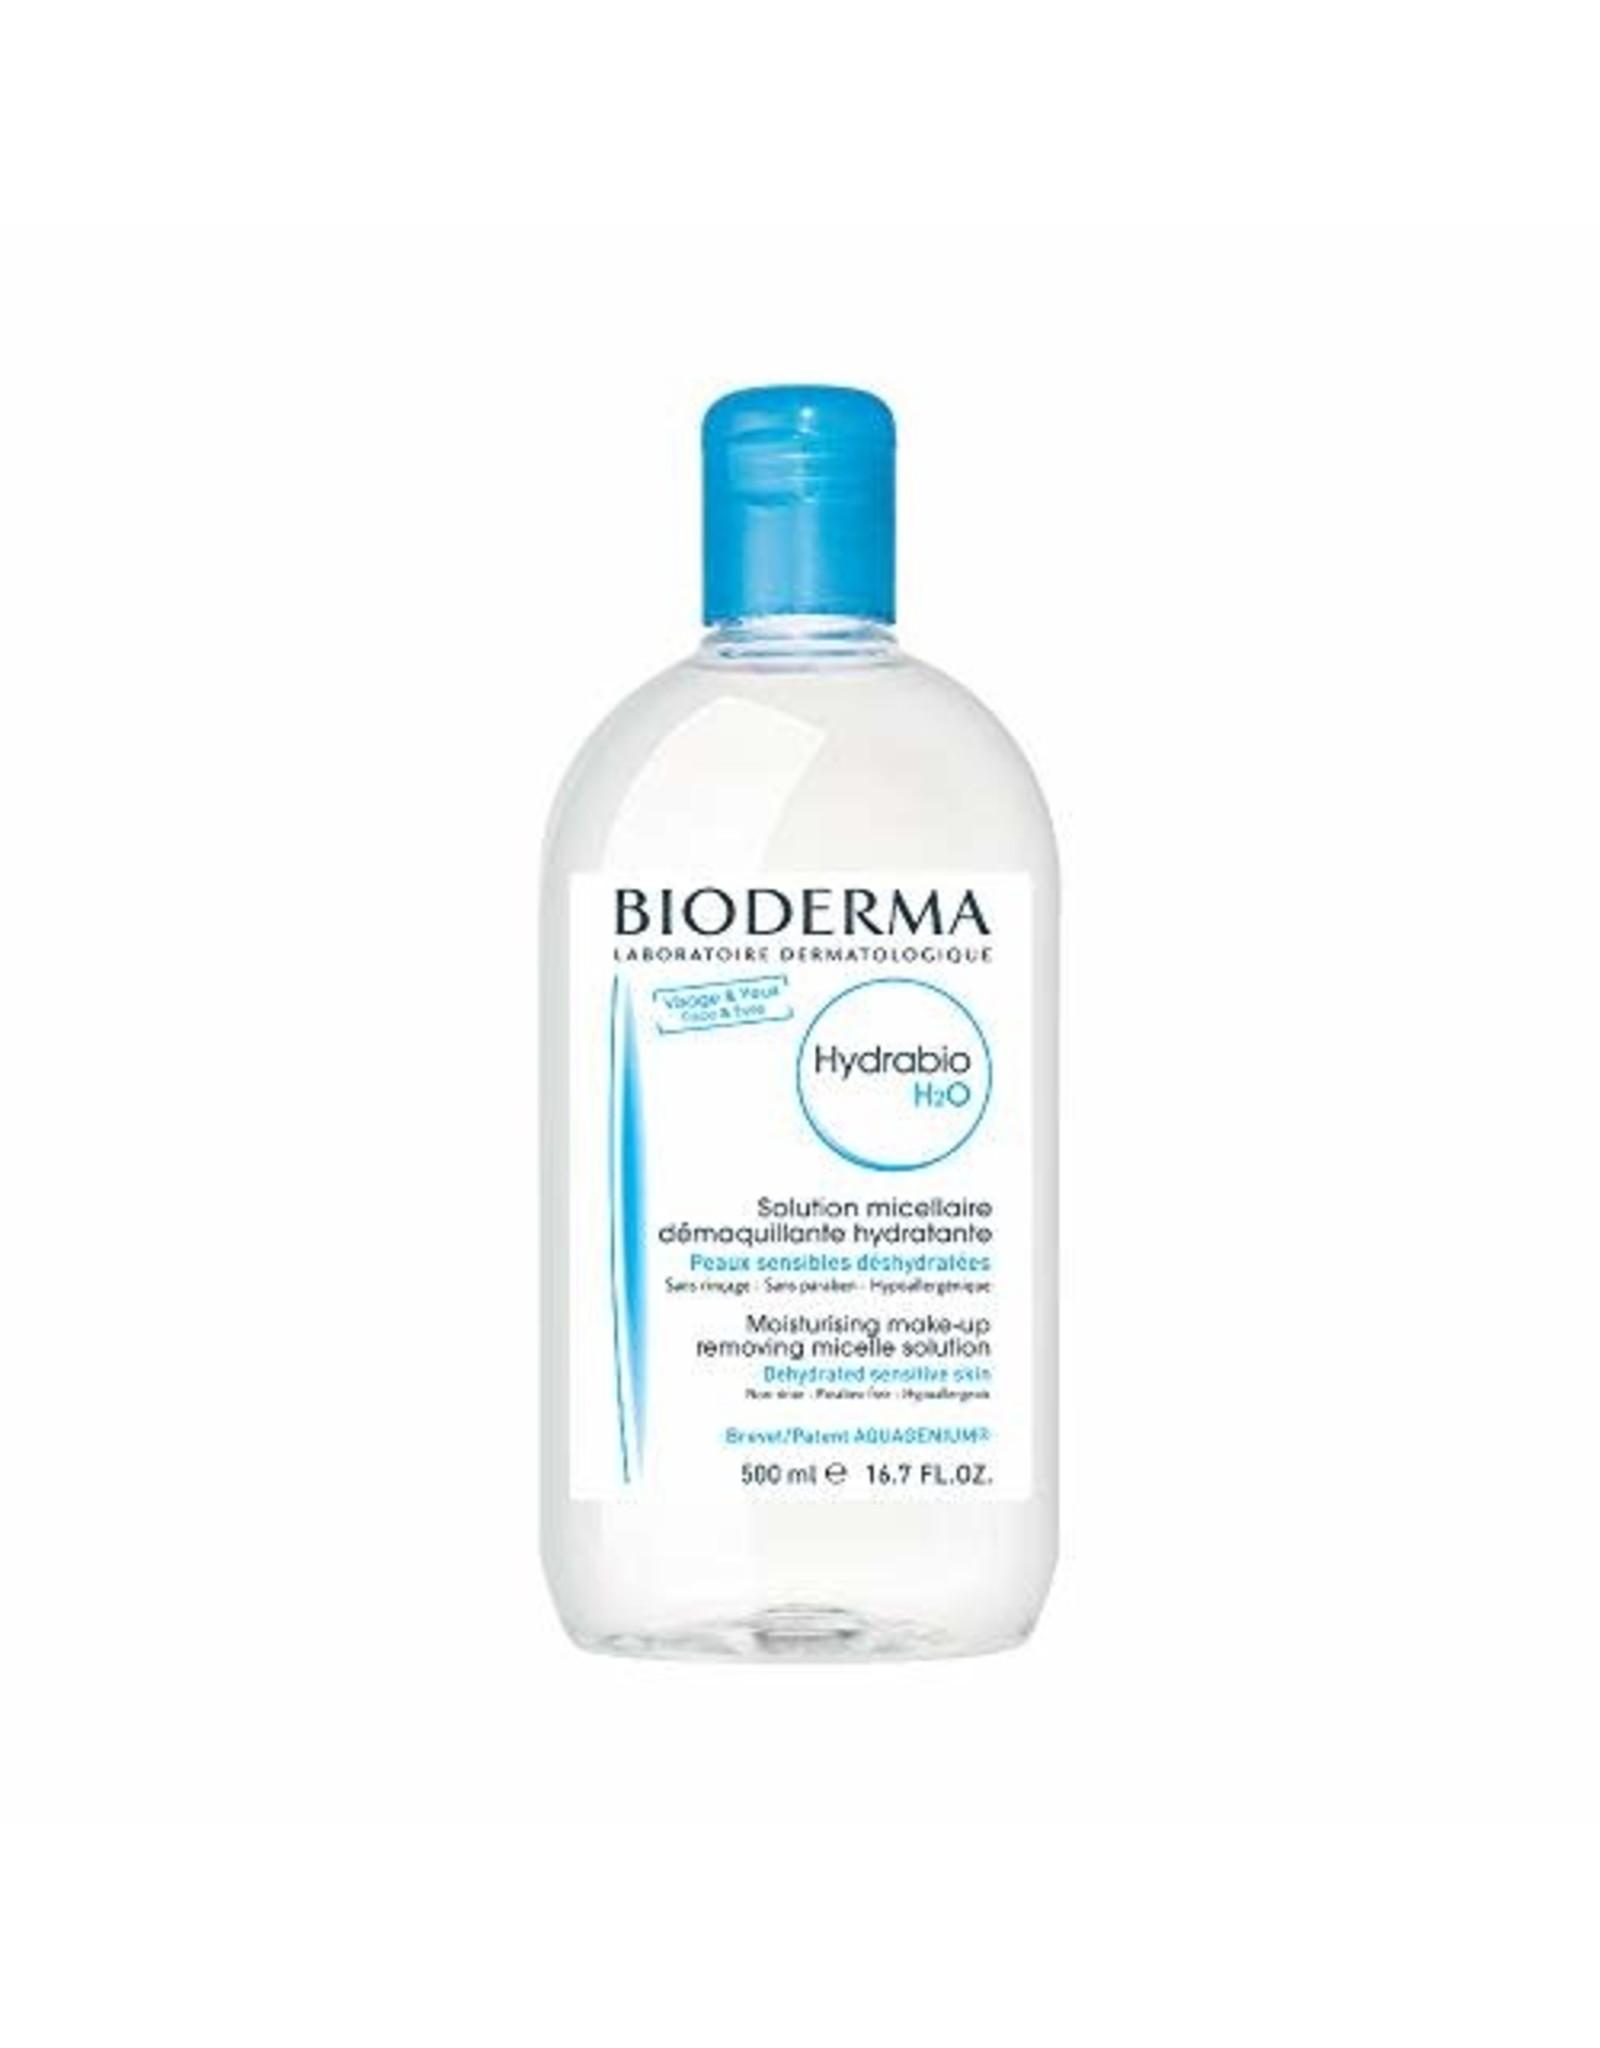 Bioderma Bioderma Hydrabio H2O 500ml + Hydra Bio Essence